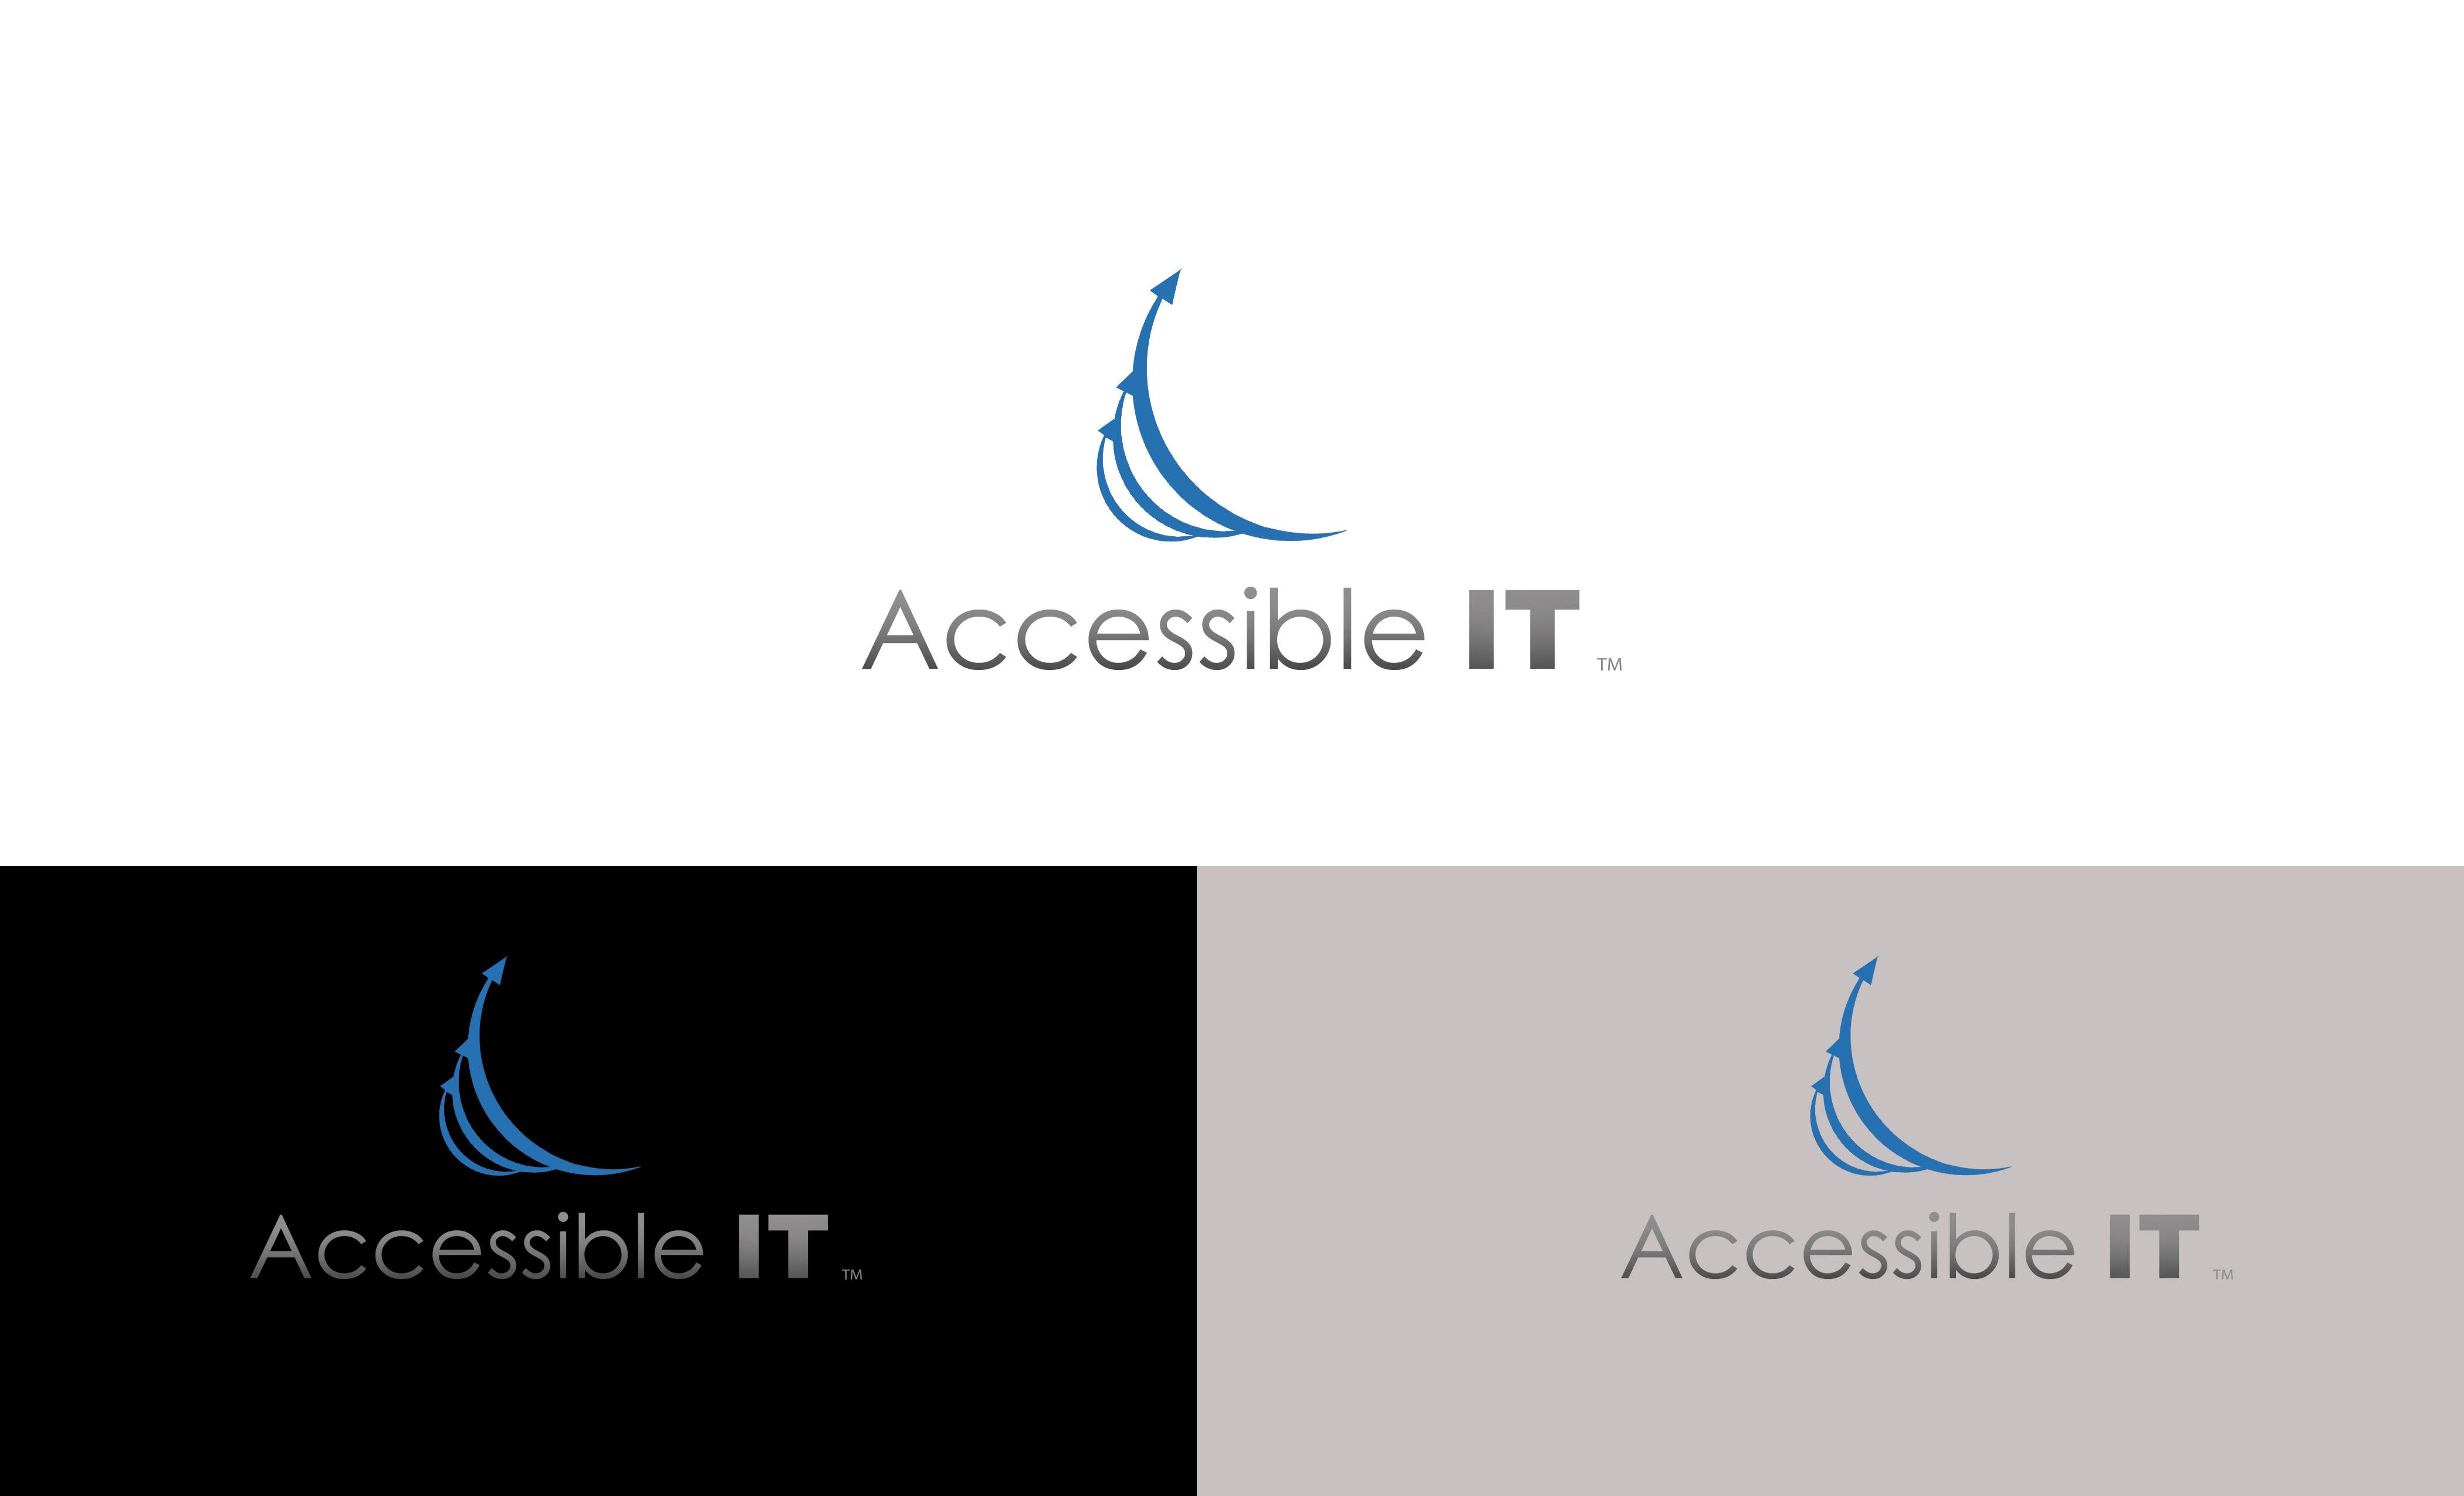 Logo Design by Unique Gallardo - Entry No. 46 in the Logo Design Contest Logo Design Needed for Exciting New Company Accessible IT.